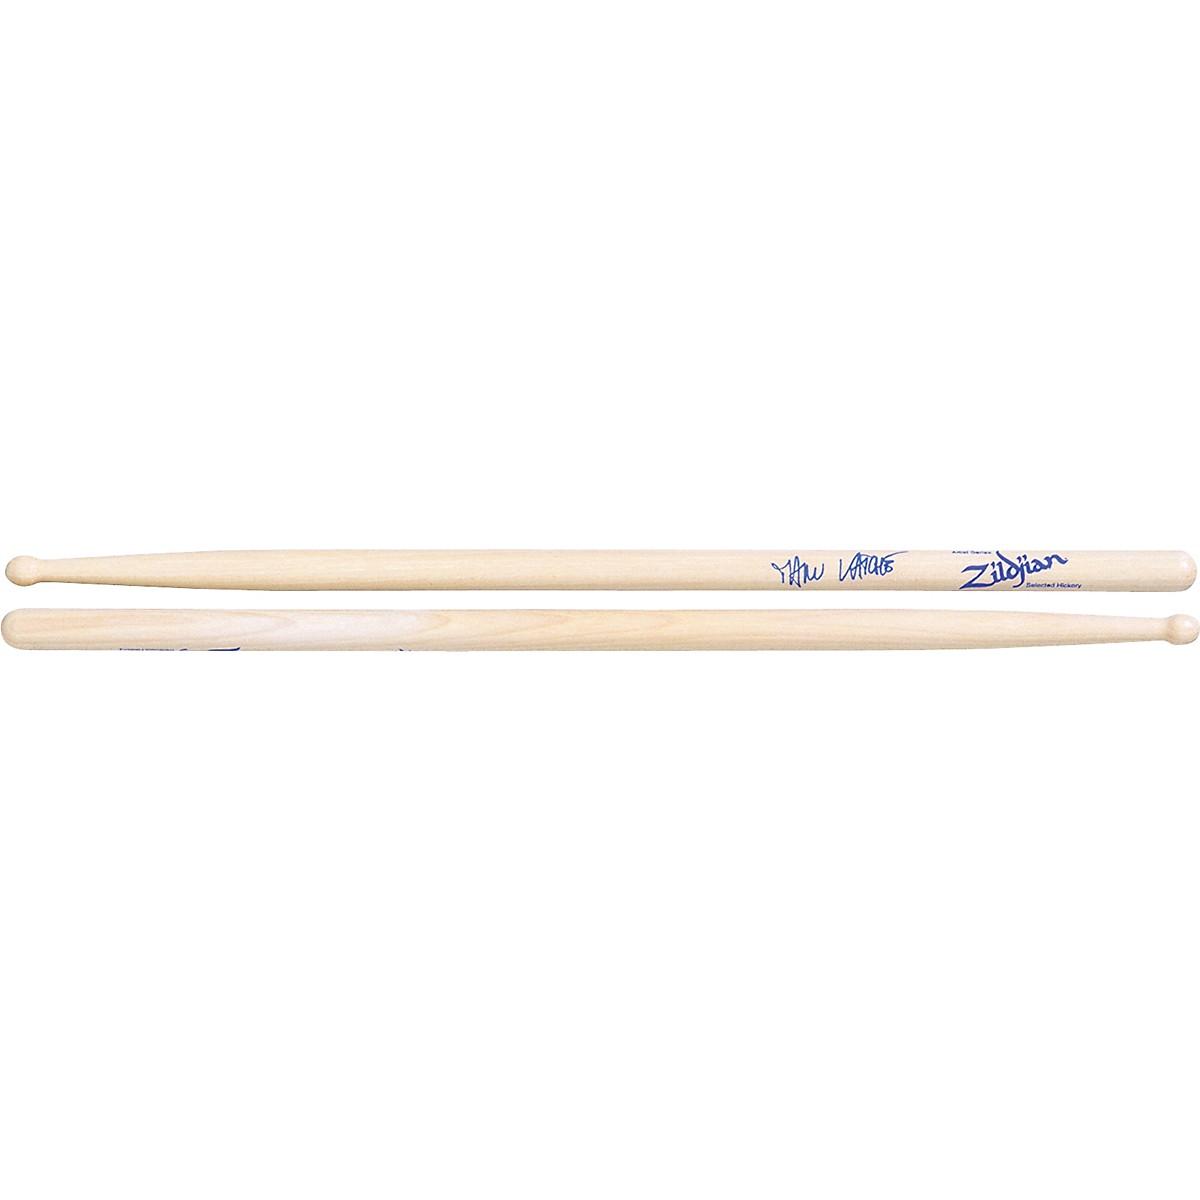 Zildjian Manu Katche Artist Series Signature Drumsticks